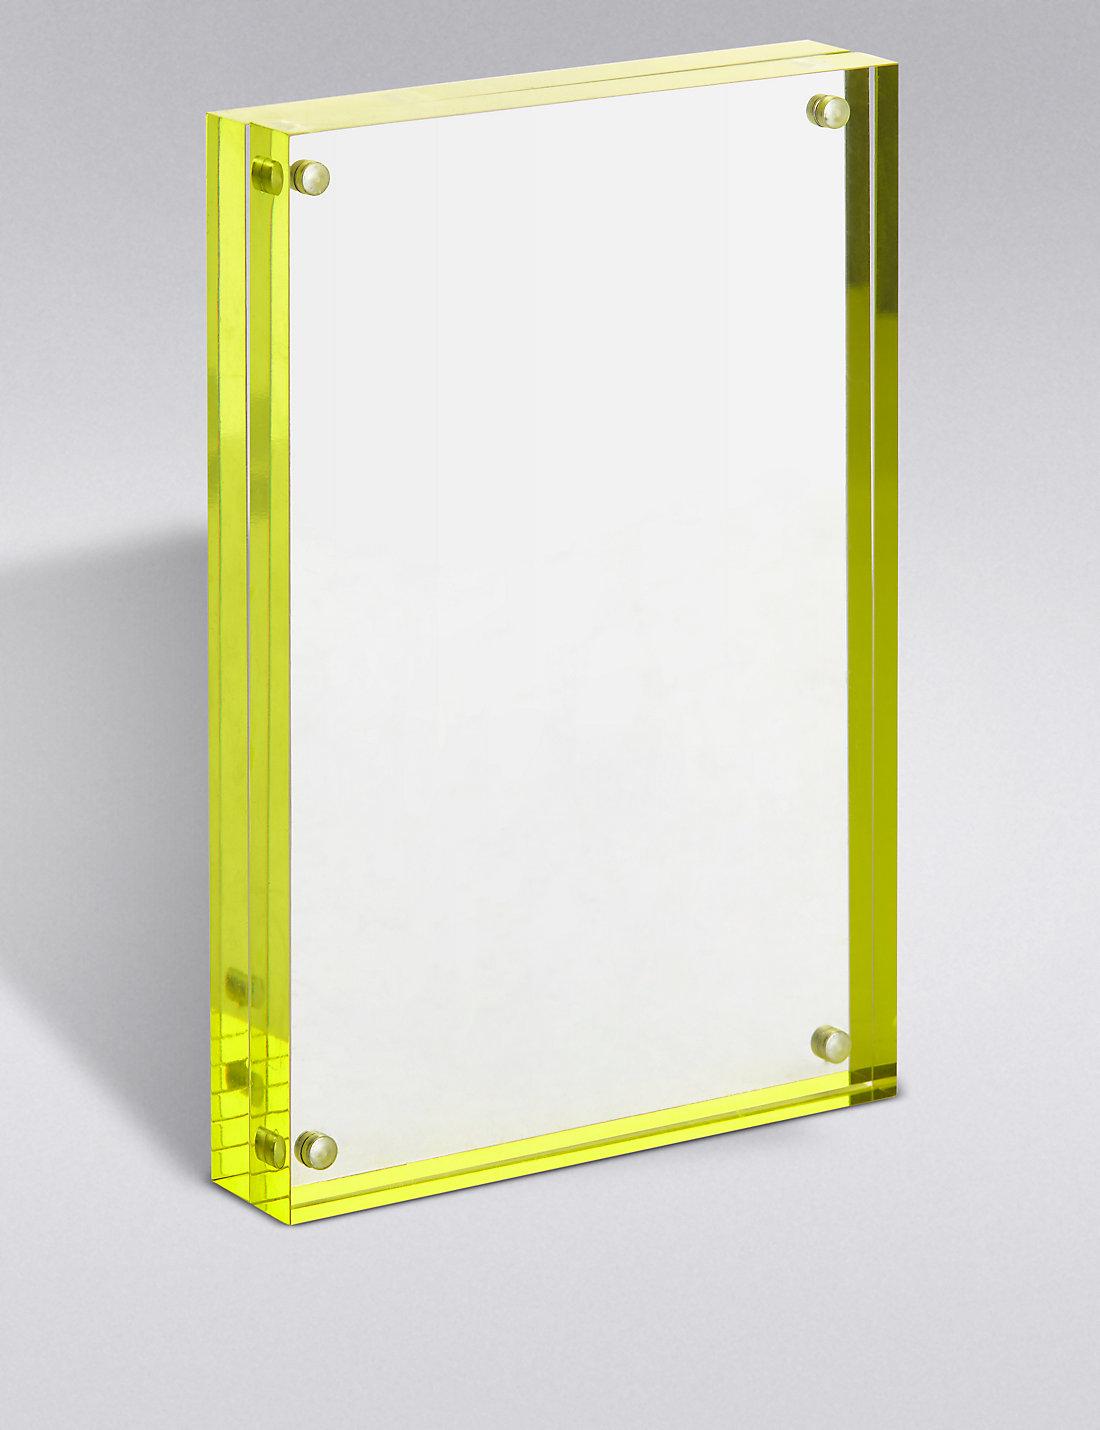 Acrylic photo frame 10 x 15cm 4 x 6inch ms acrylic photo frame 10 x 15cm 4 x 6inch jeuxipadfo Image collections